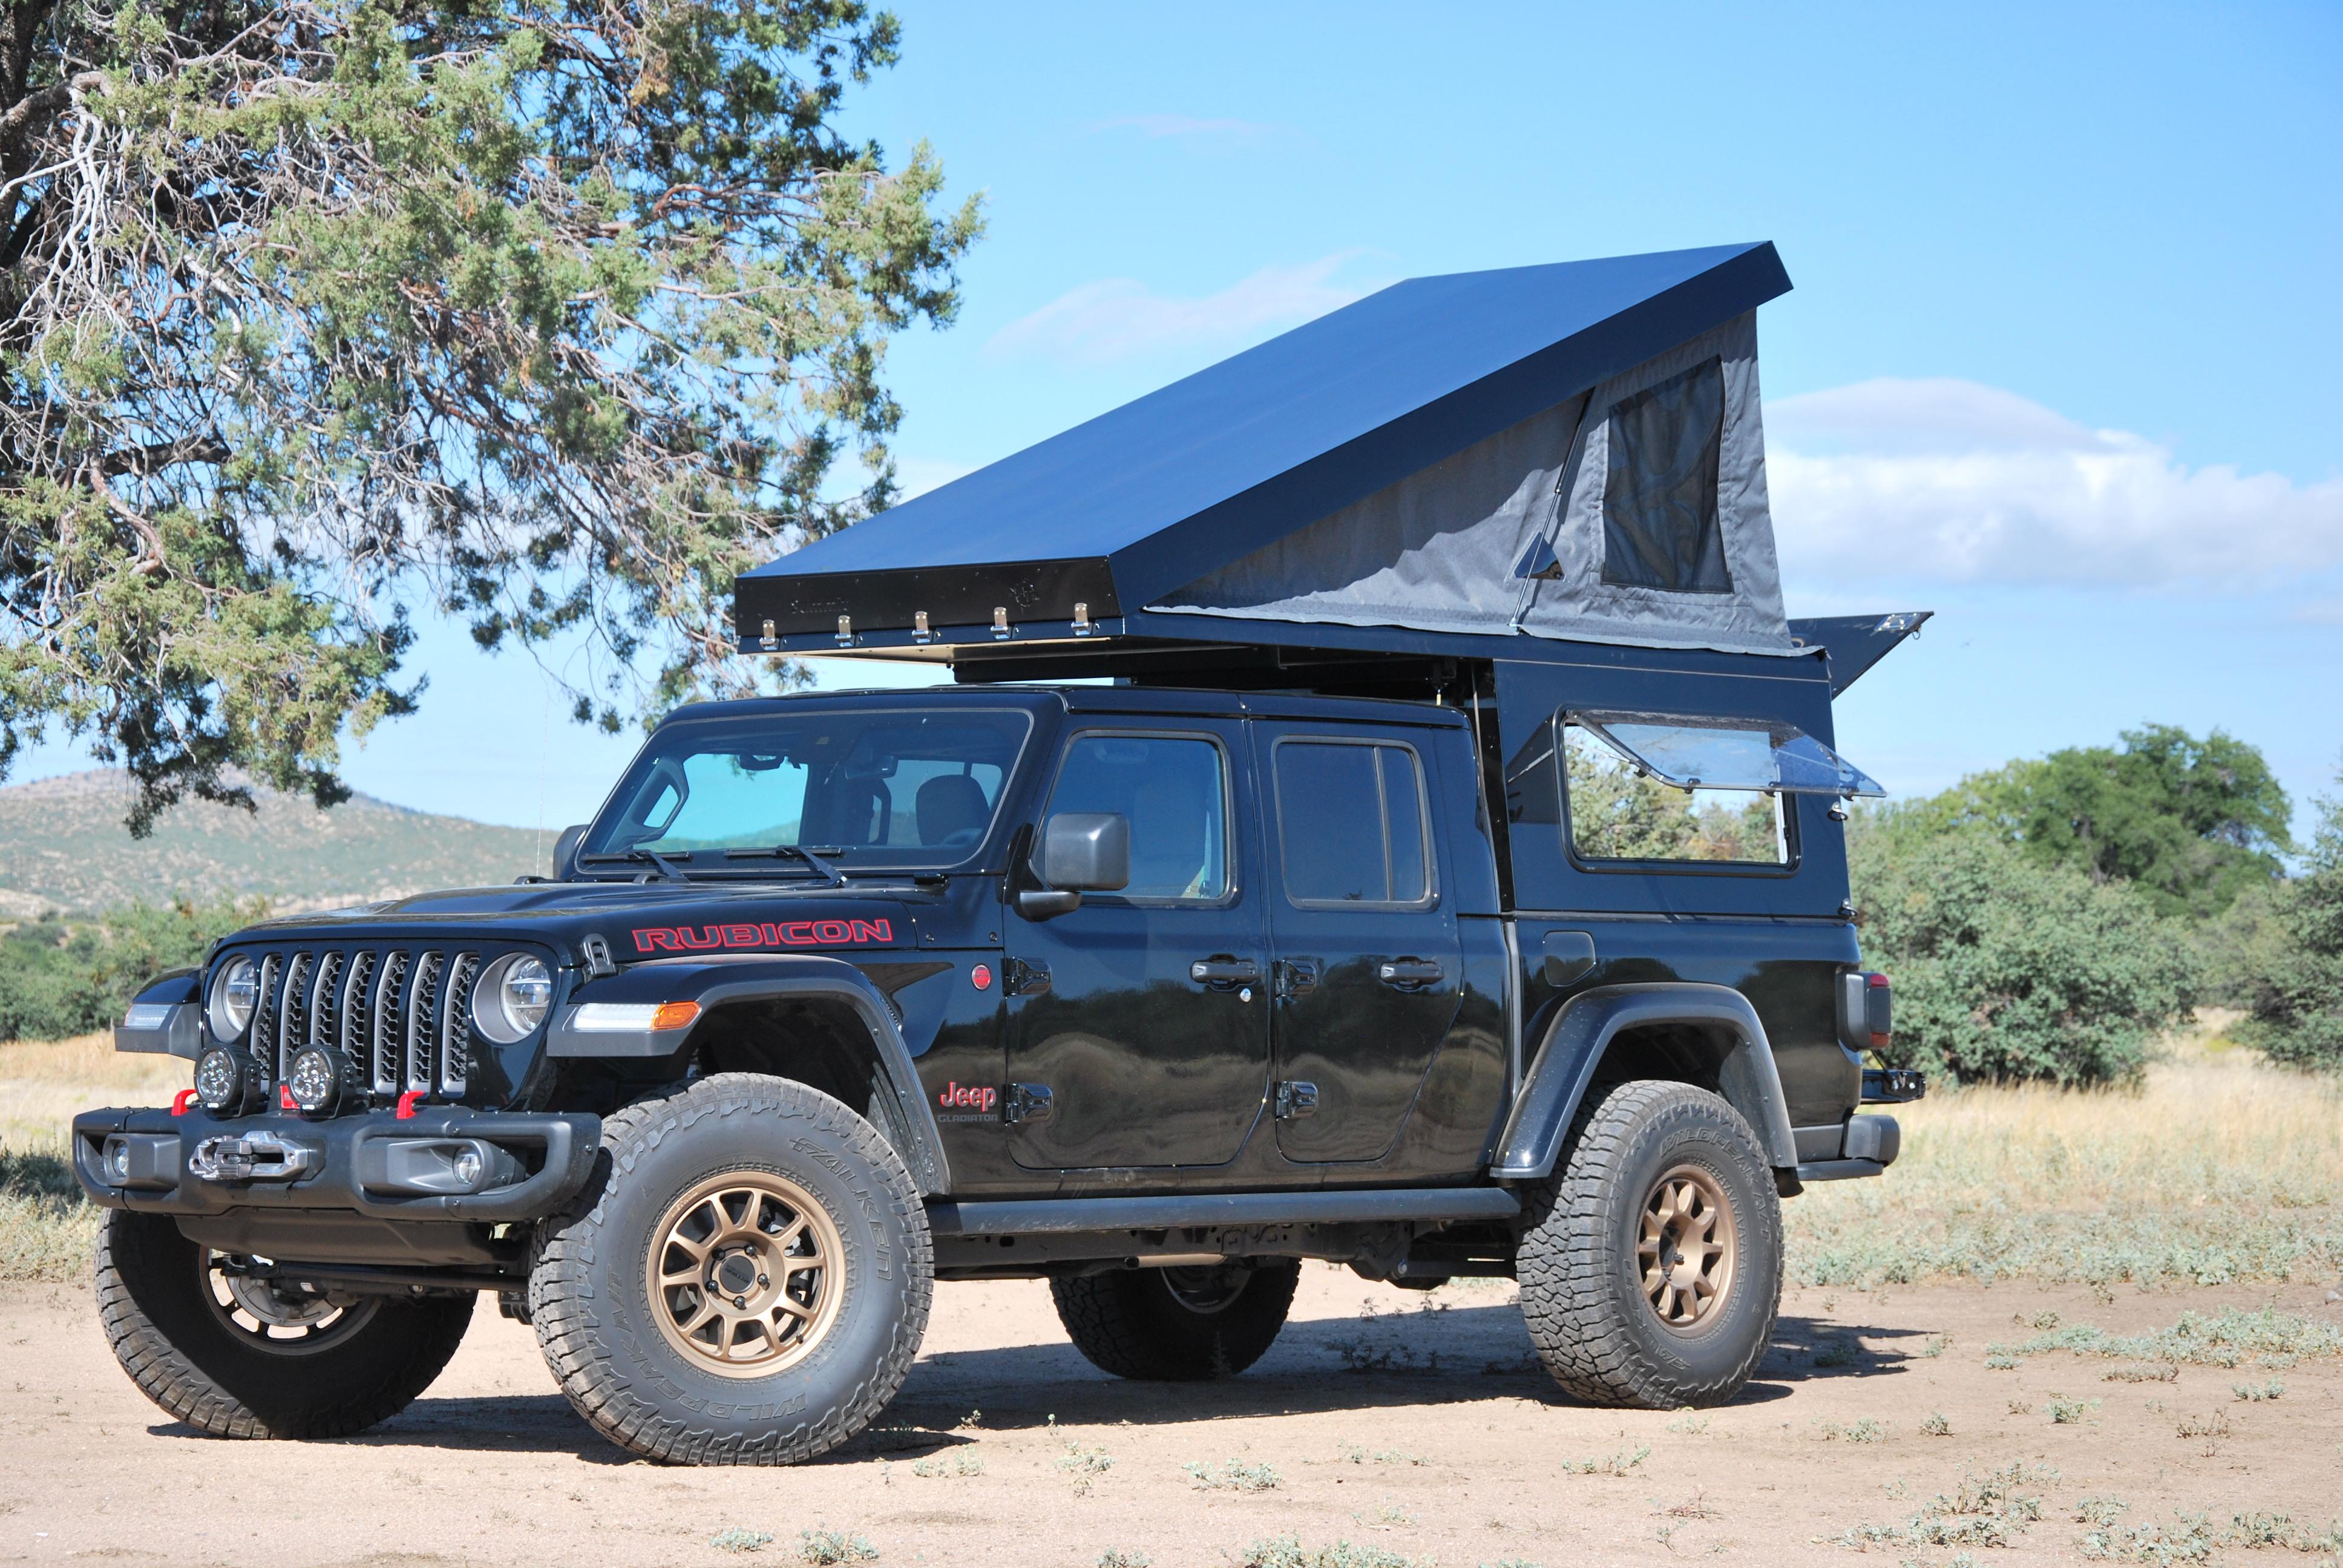 01_Jeep_Gladiator_Camper